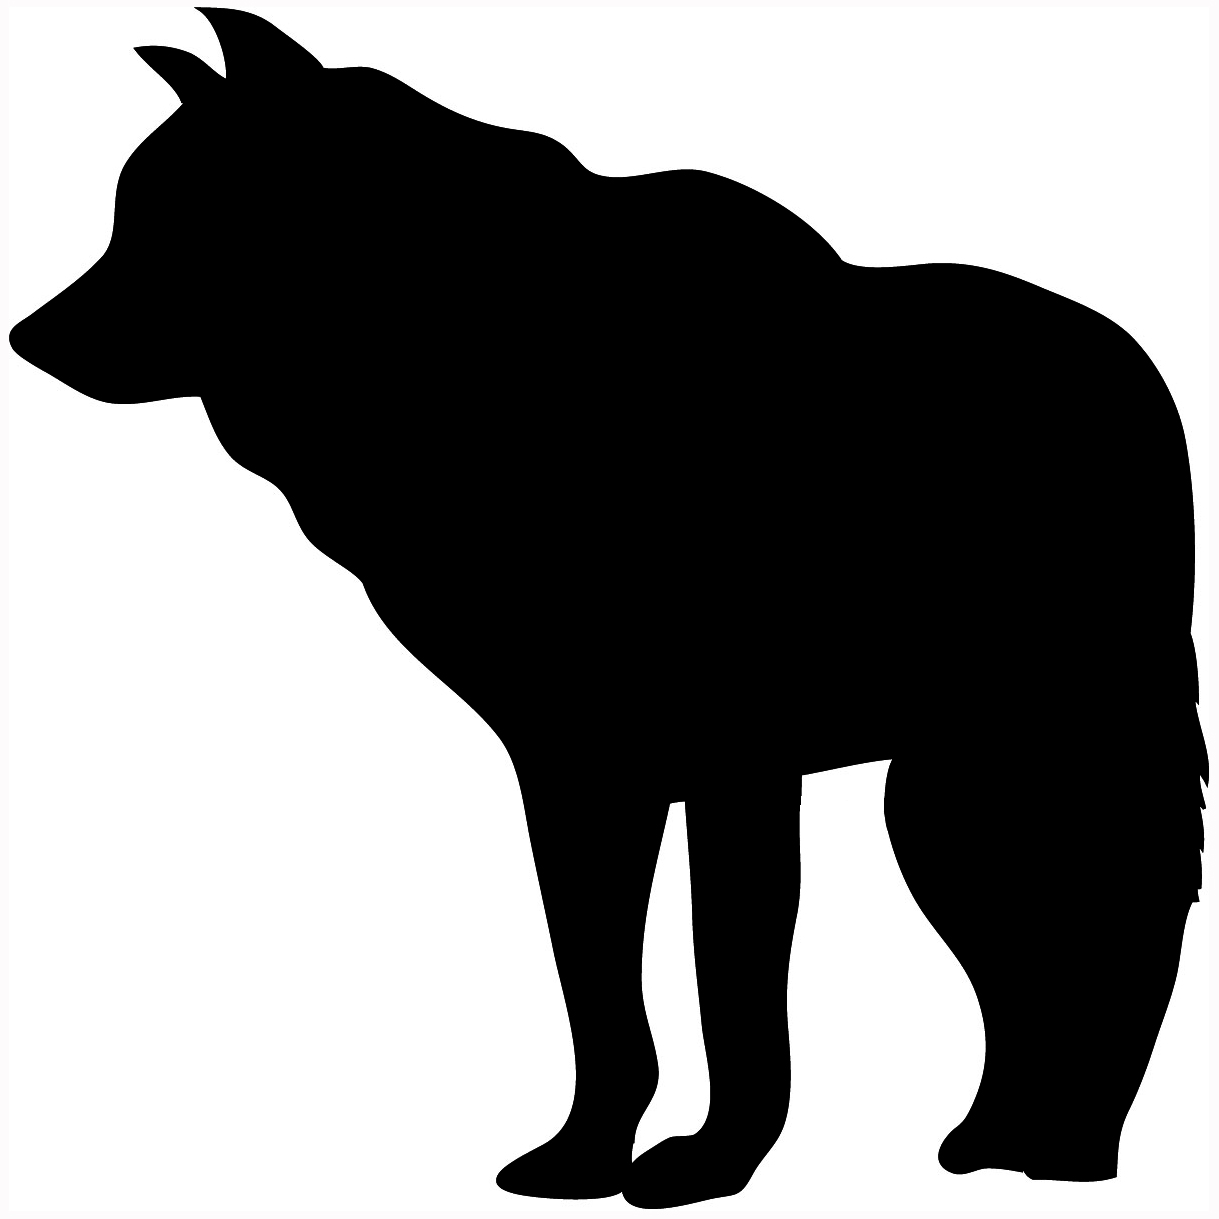 Wolf Silhouette Clip Art - ClipArt Best